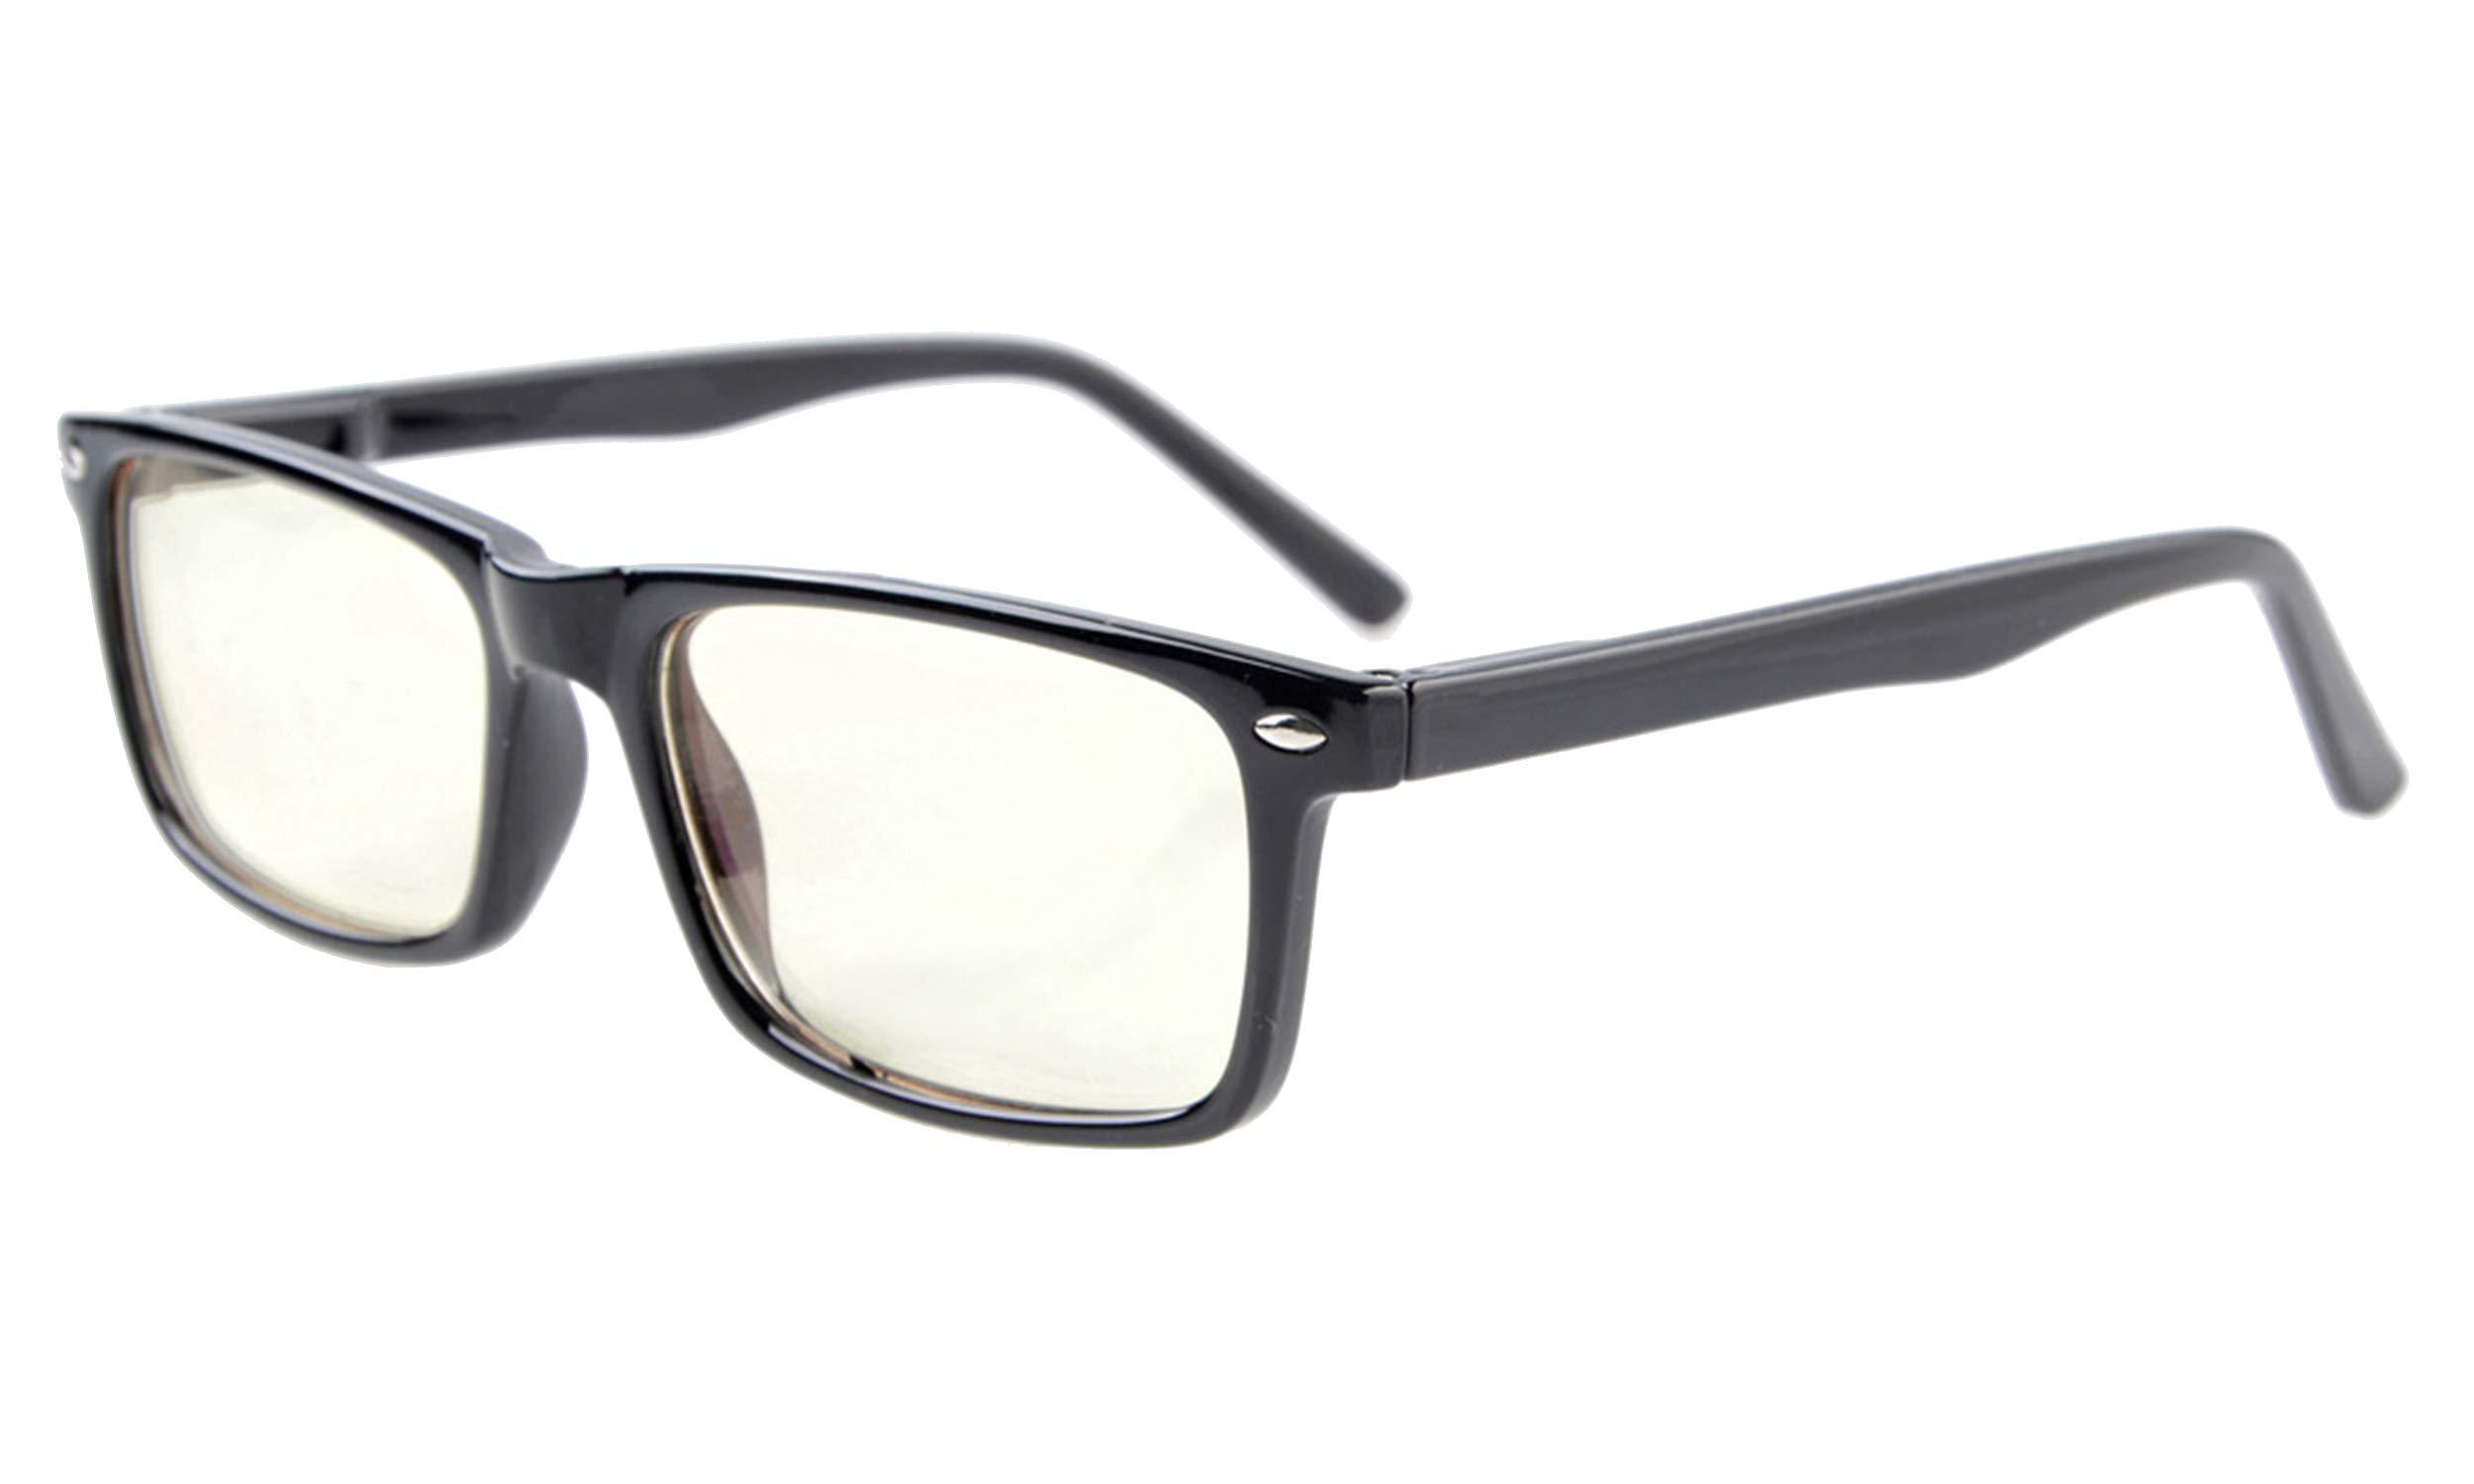 972eff854d6 Amazon.com  Eyekepper Readers UV Protection